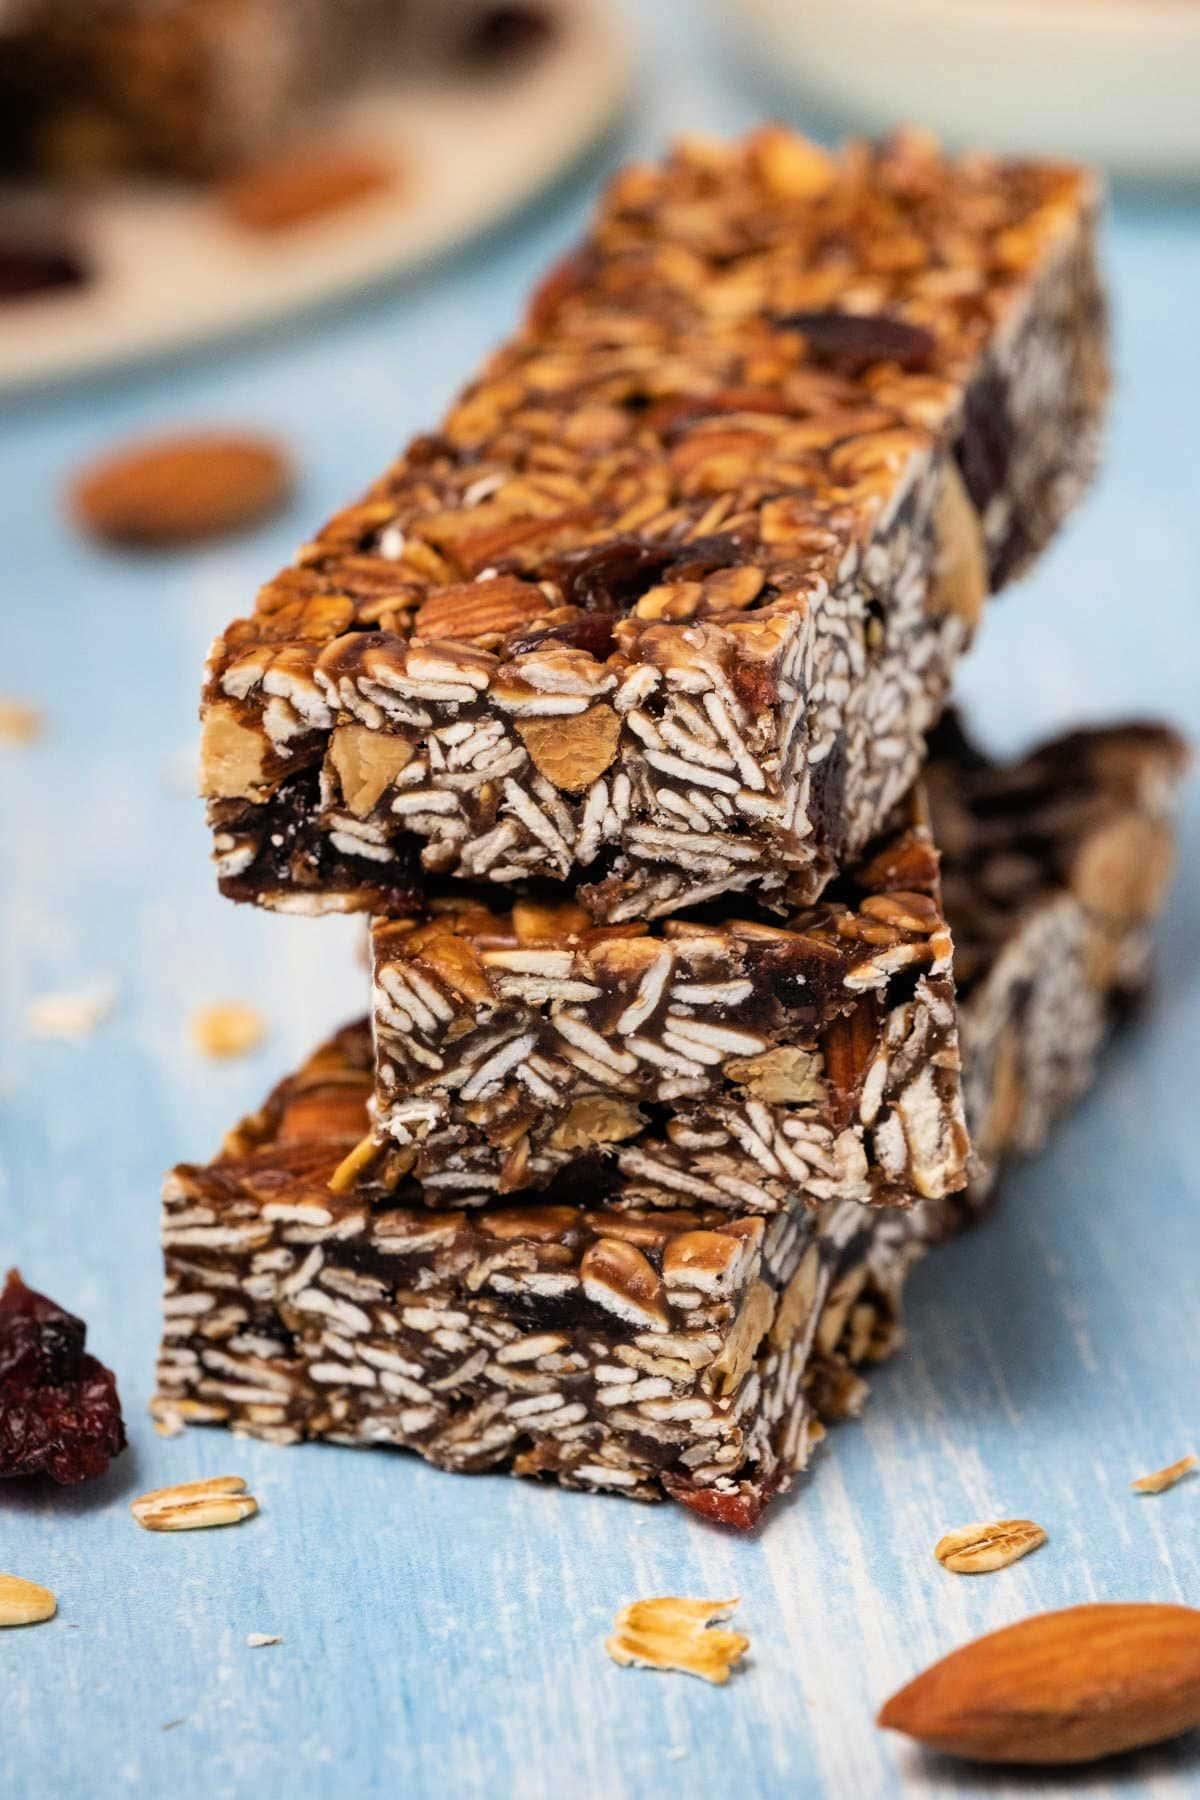 Stack of three granola bars.